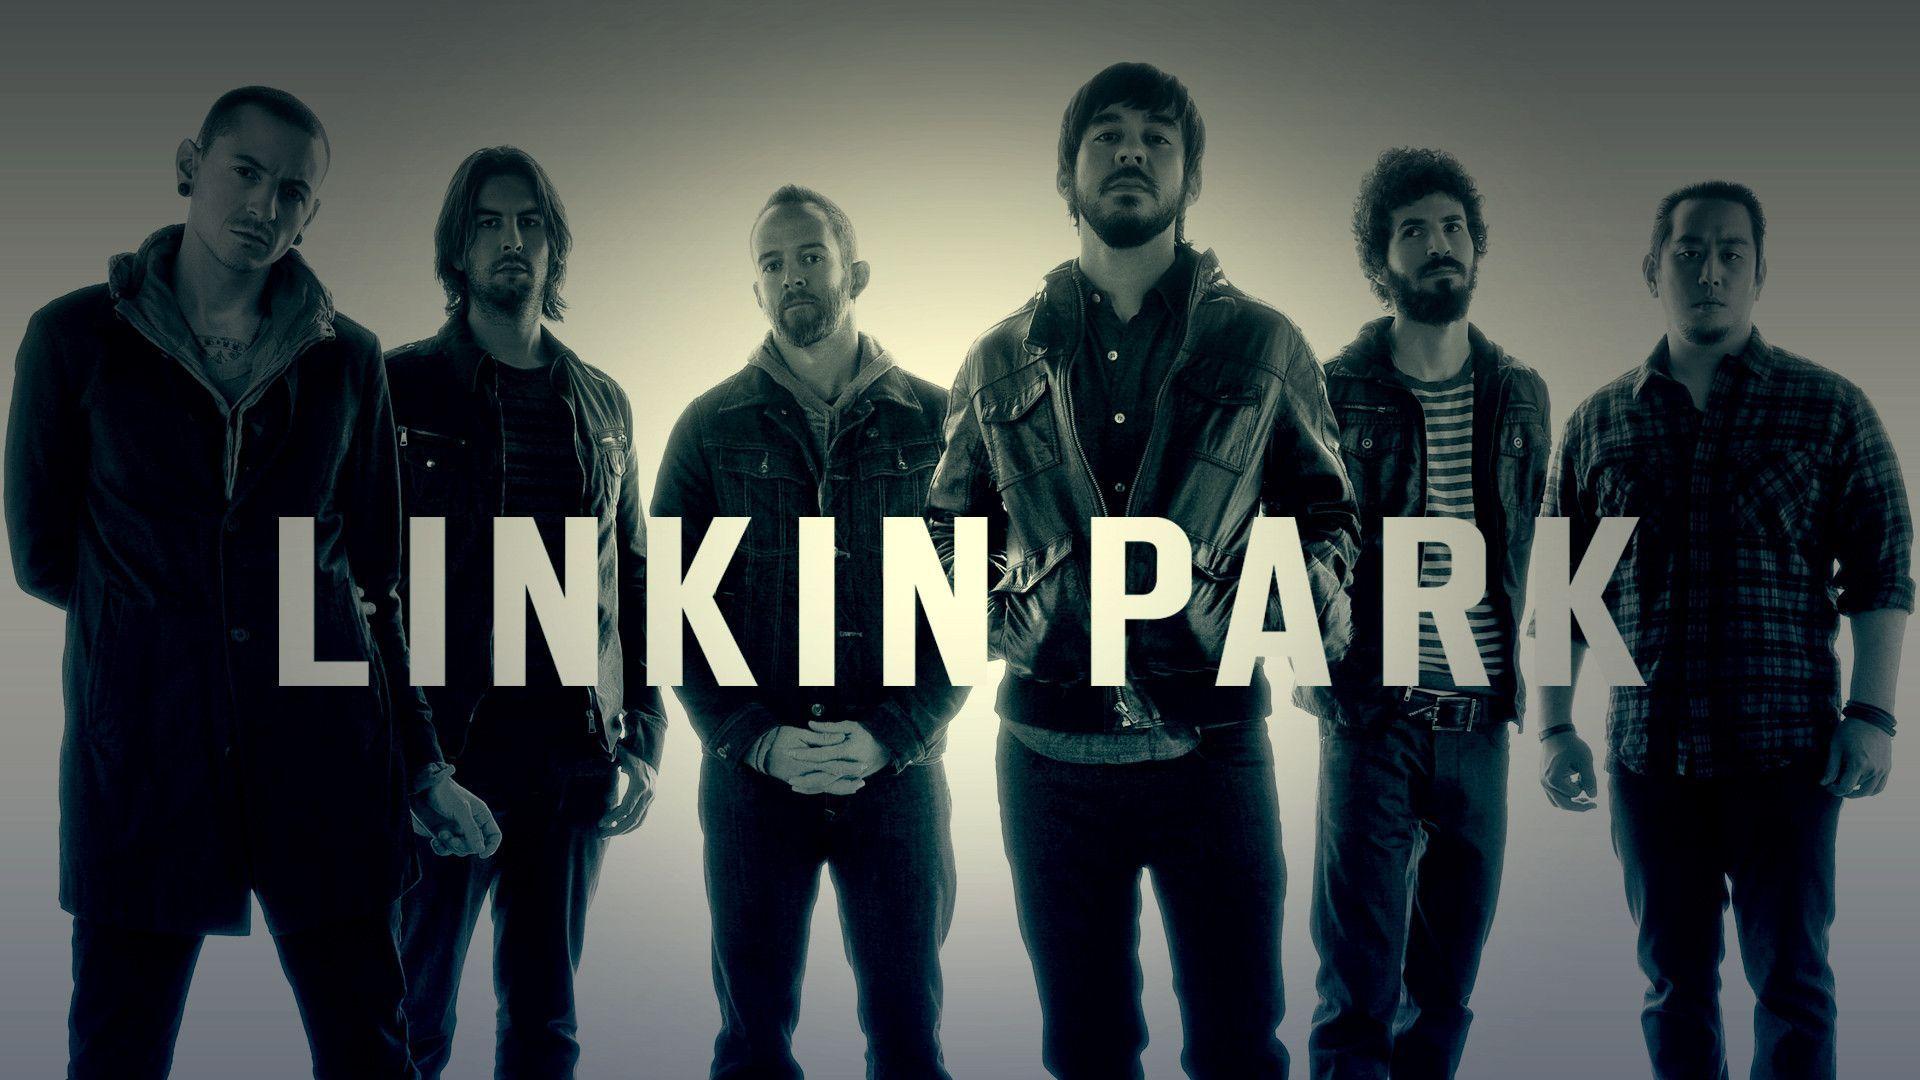 Linkin Park Wallpapers High Resolution Sf Wallpaper